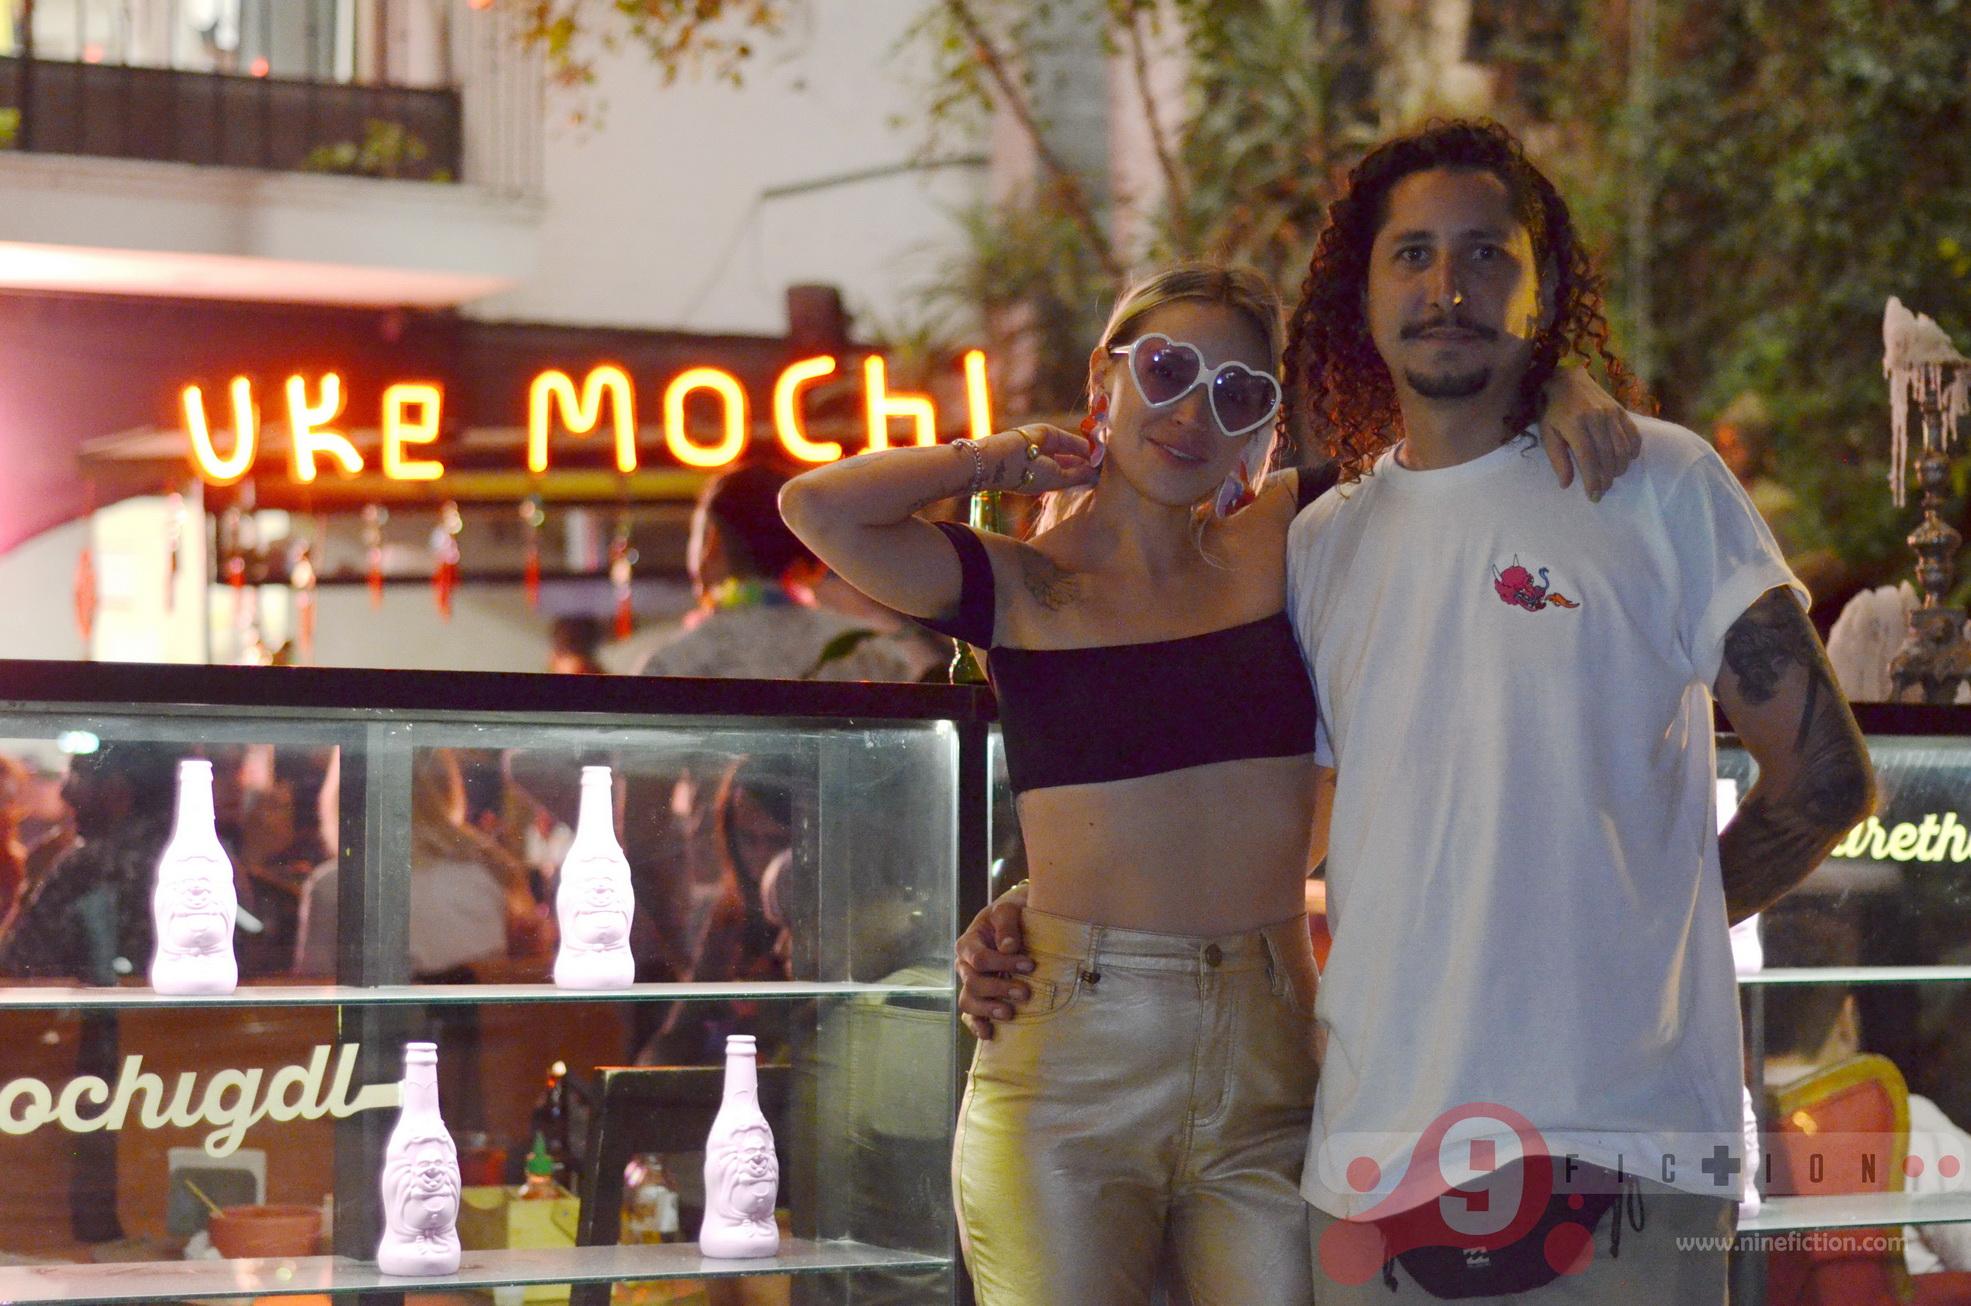 UKE MOCHI y Darfeeling - Guadalajara - Foto Salvado Tabares - Nine Fiction 19